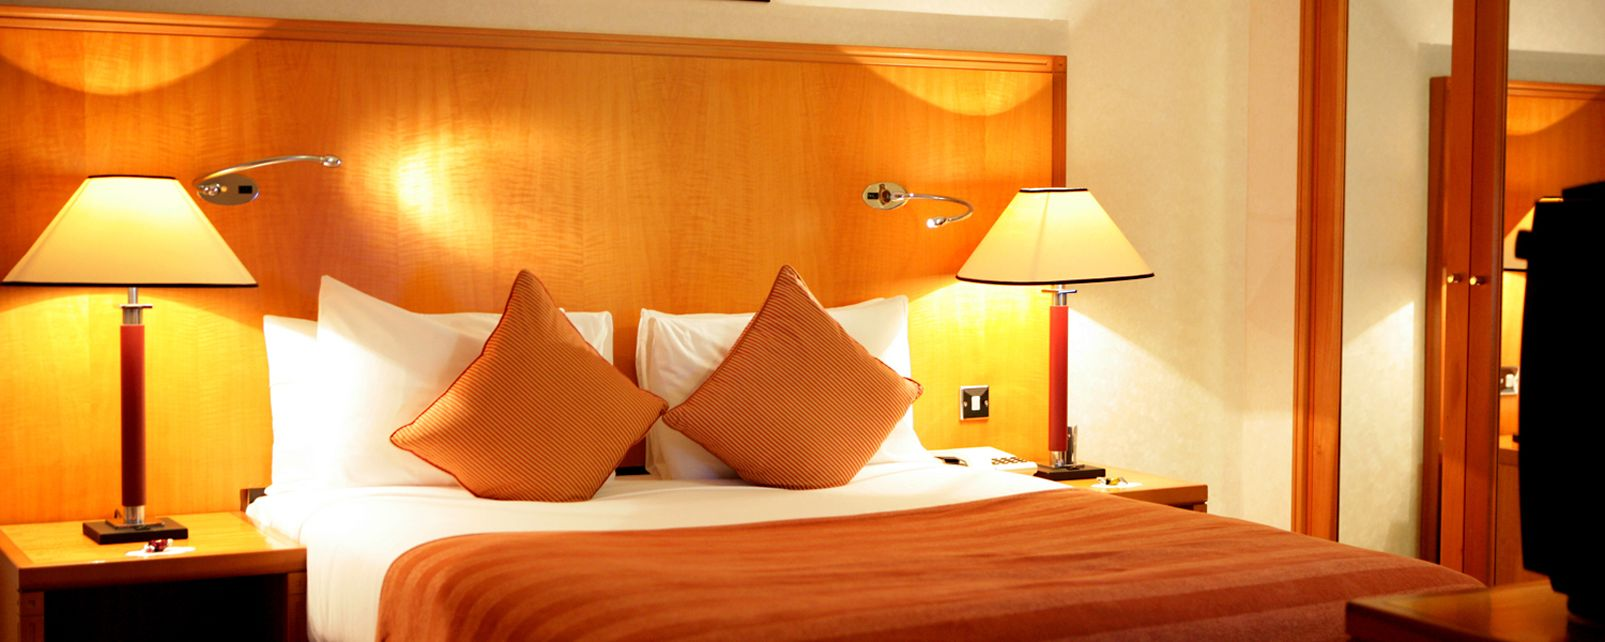 Hotel Jolly St Ermins